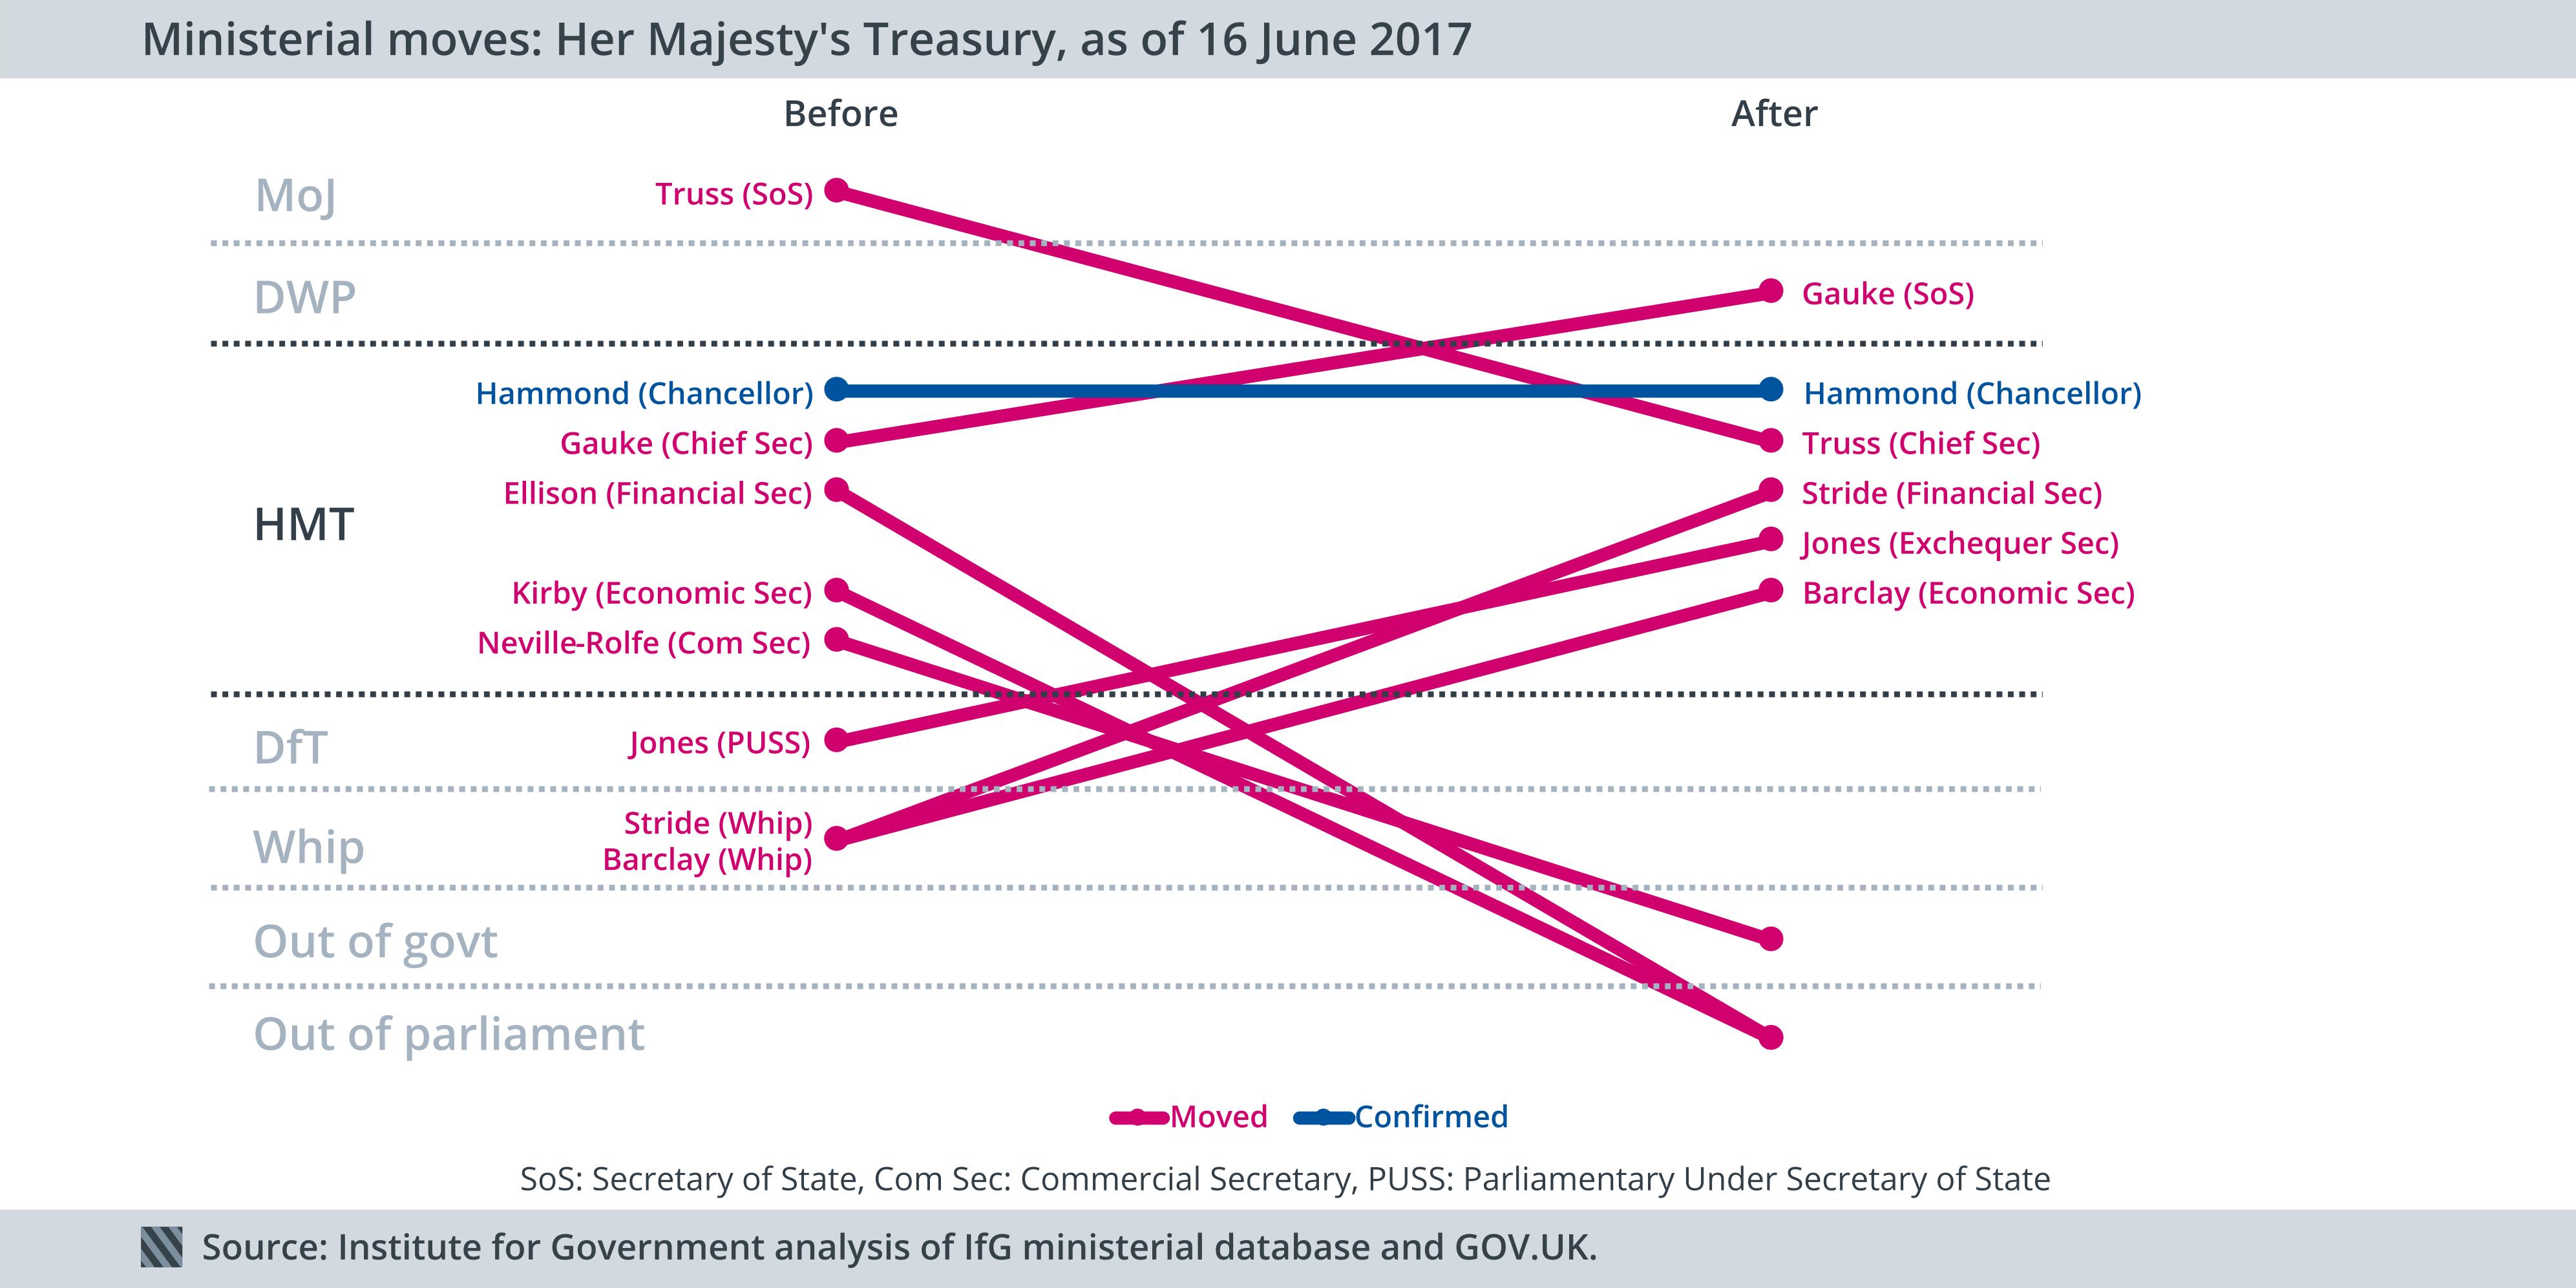 Ministerial moves: Treasury